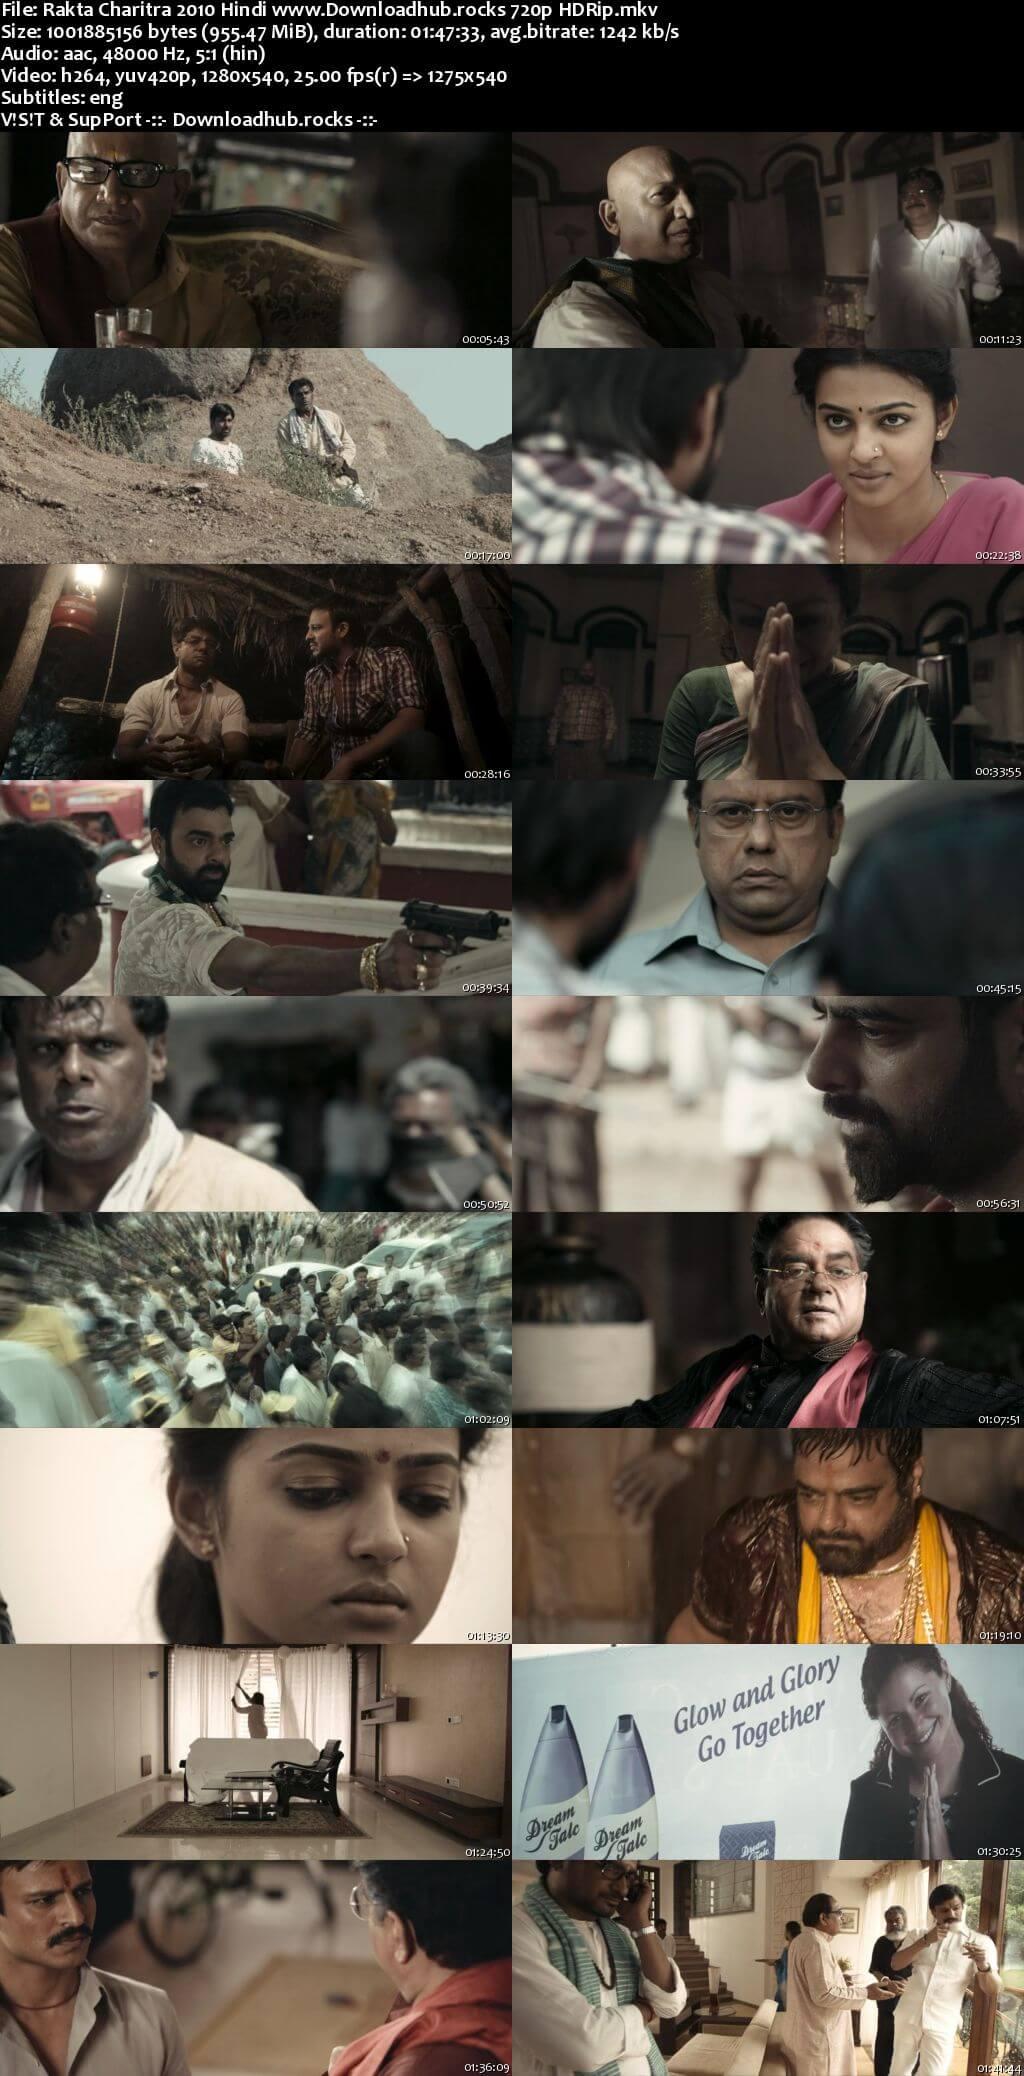 Rakhta Charitra 2010 Hindi 720p HDRip ESubs